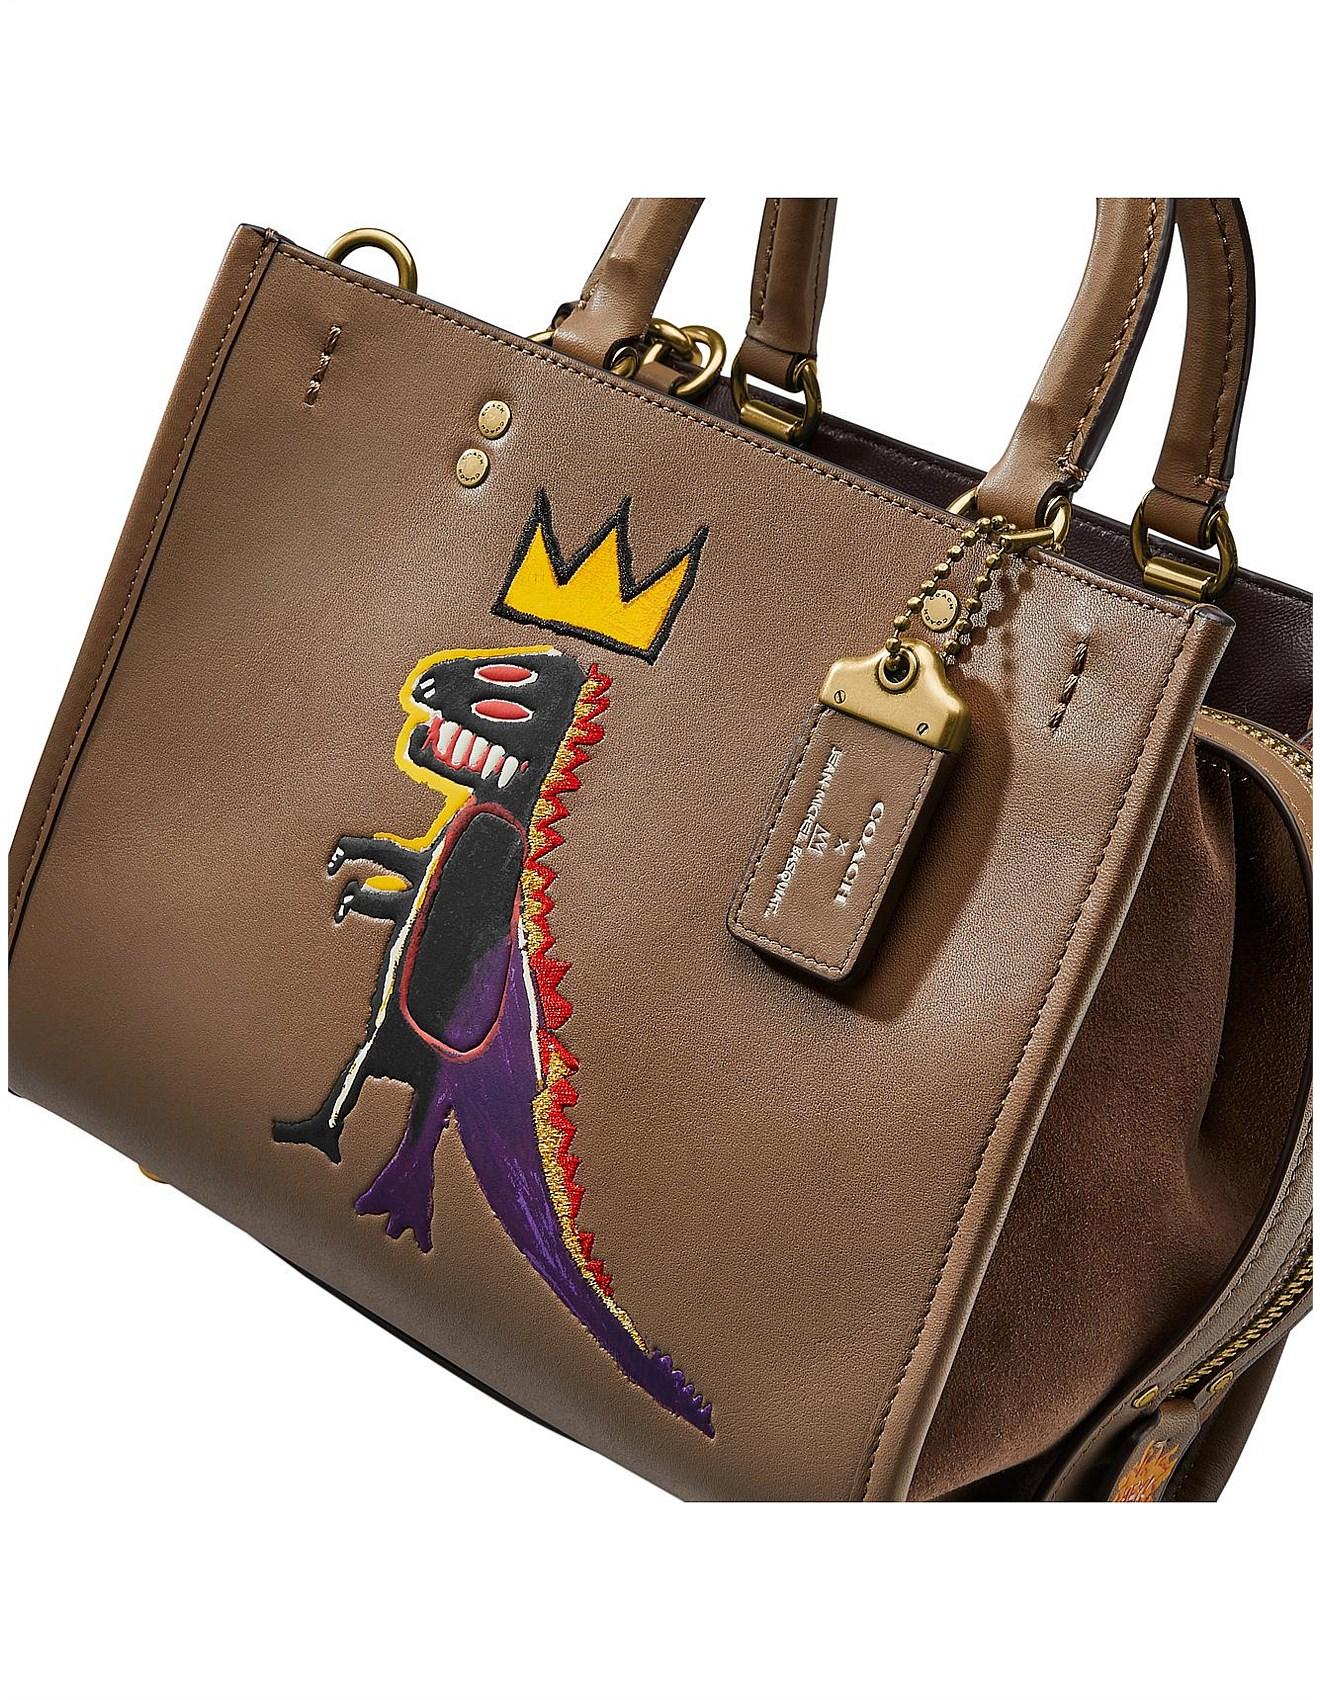 Womens Shoulder Bags | Shoulder Bags For Women | David